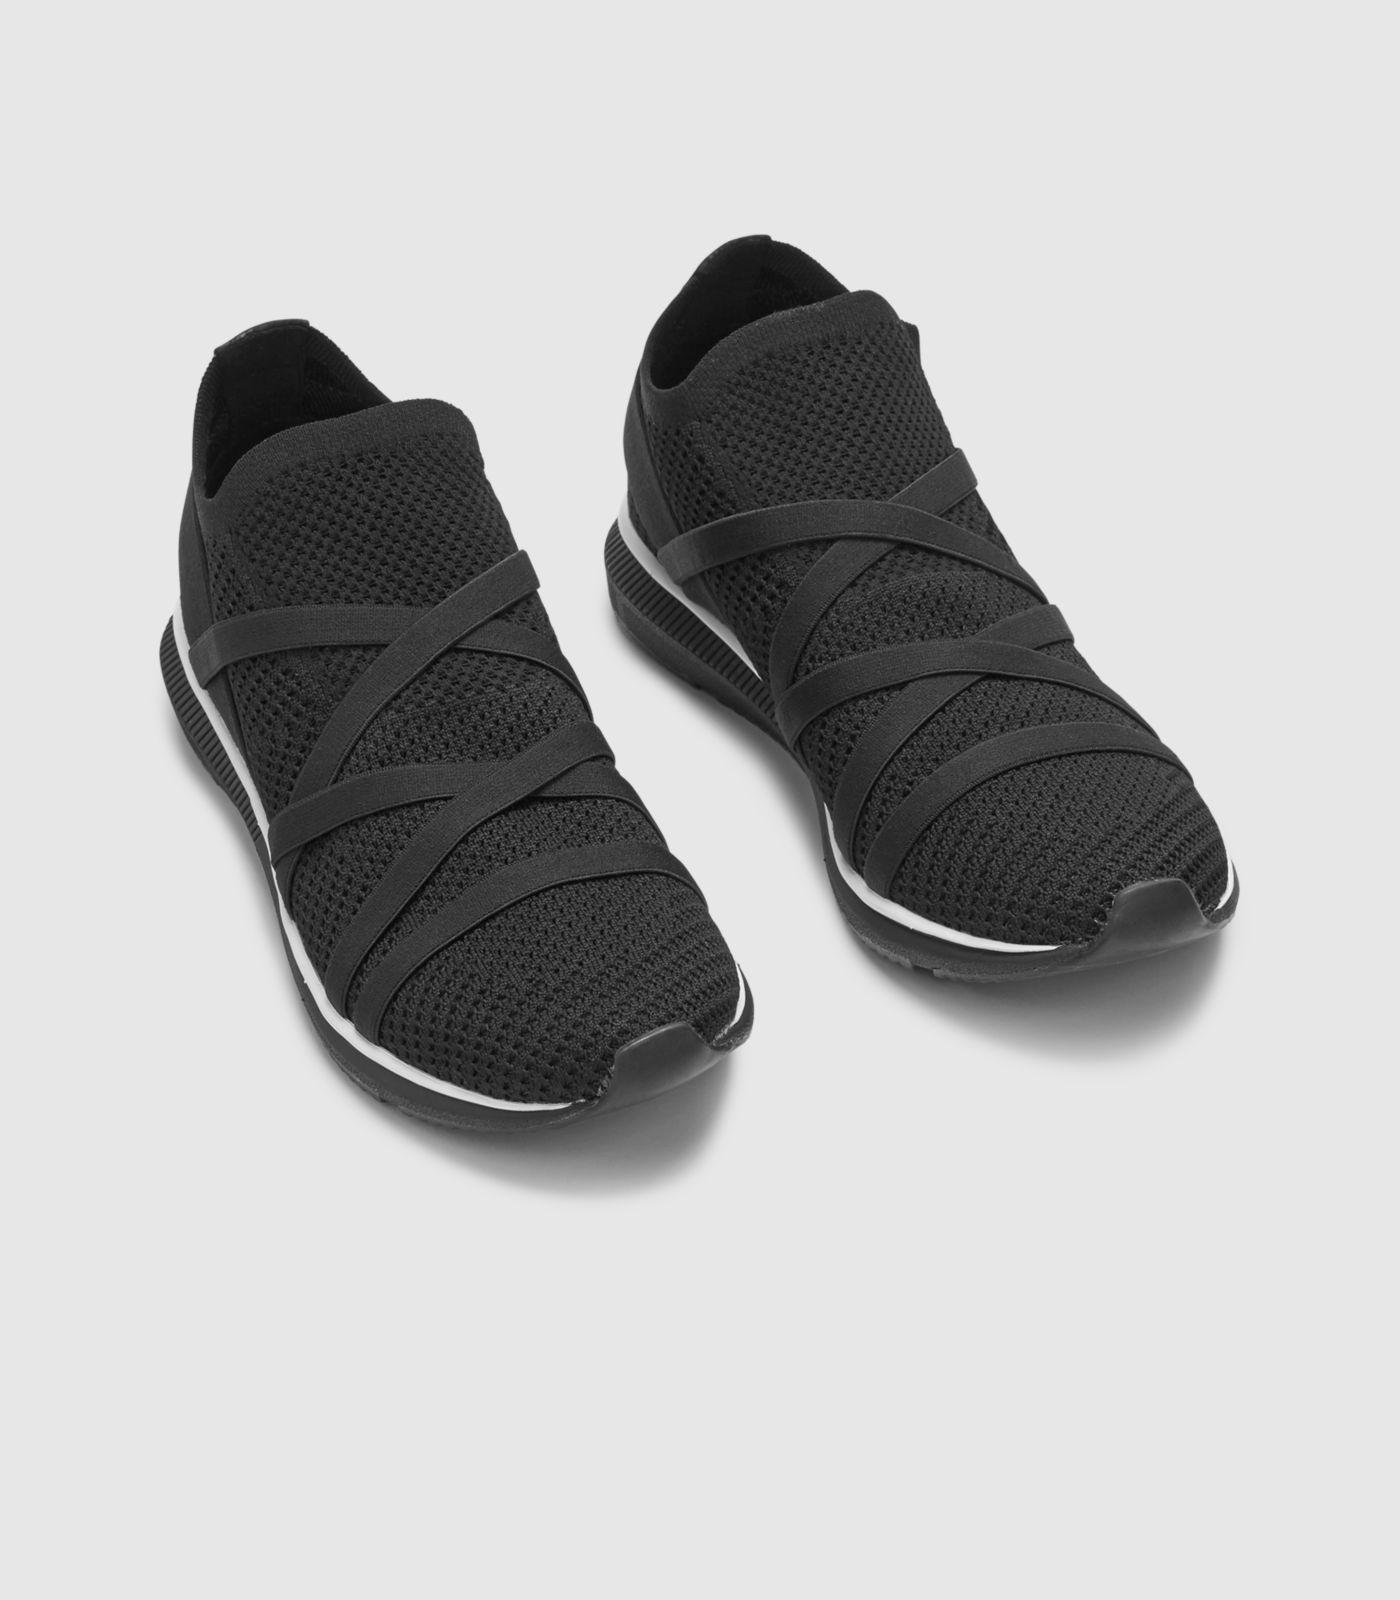 646dda68d7c3 Eileen Fisher - Black Xanady Sustainable Mesh Sneaker - Lyst. View  fullscreen